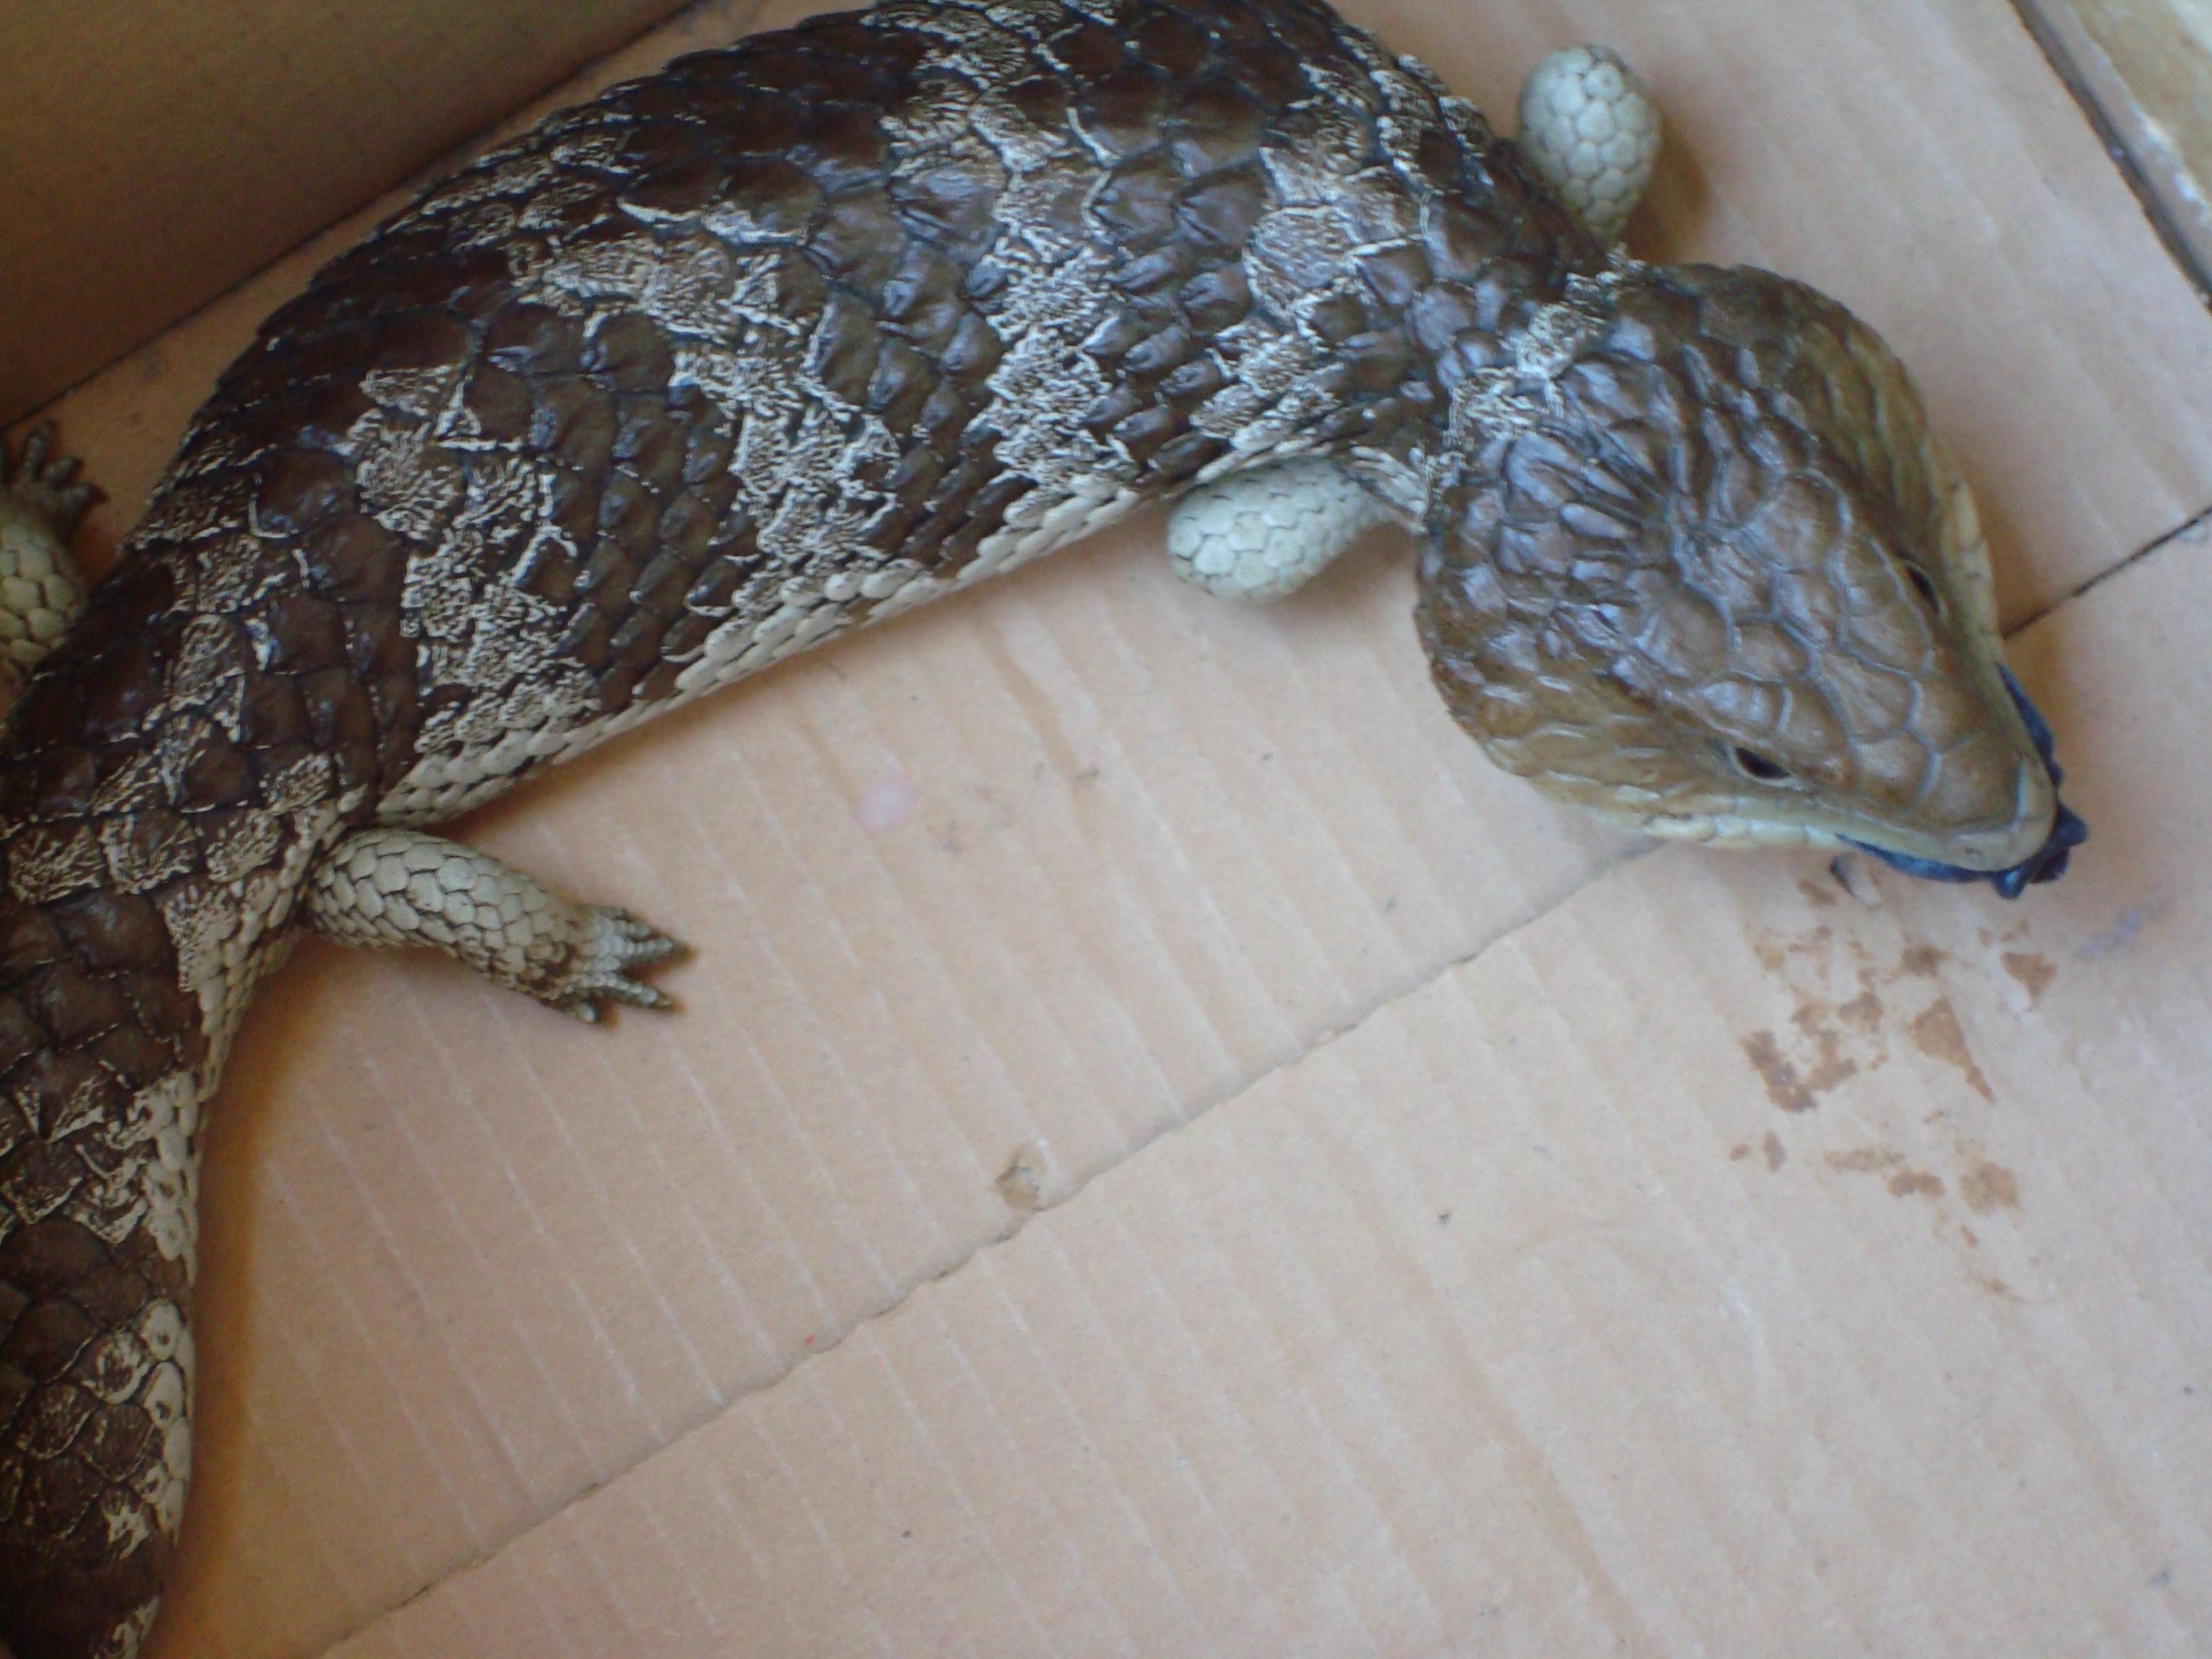 how to catch a blue tongue lizard